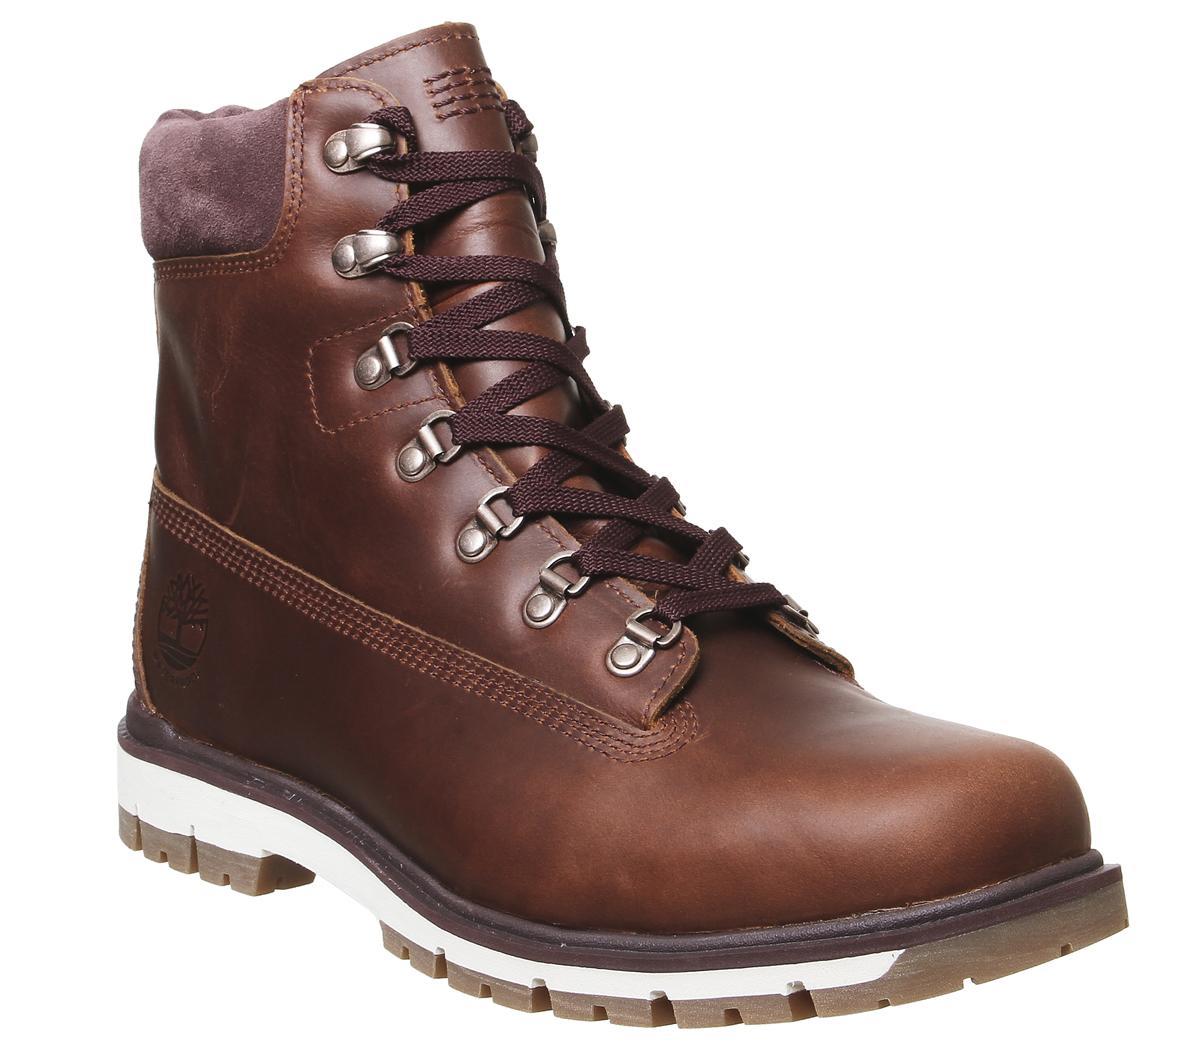 Radford Waterproof Boots